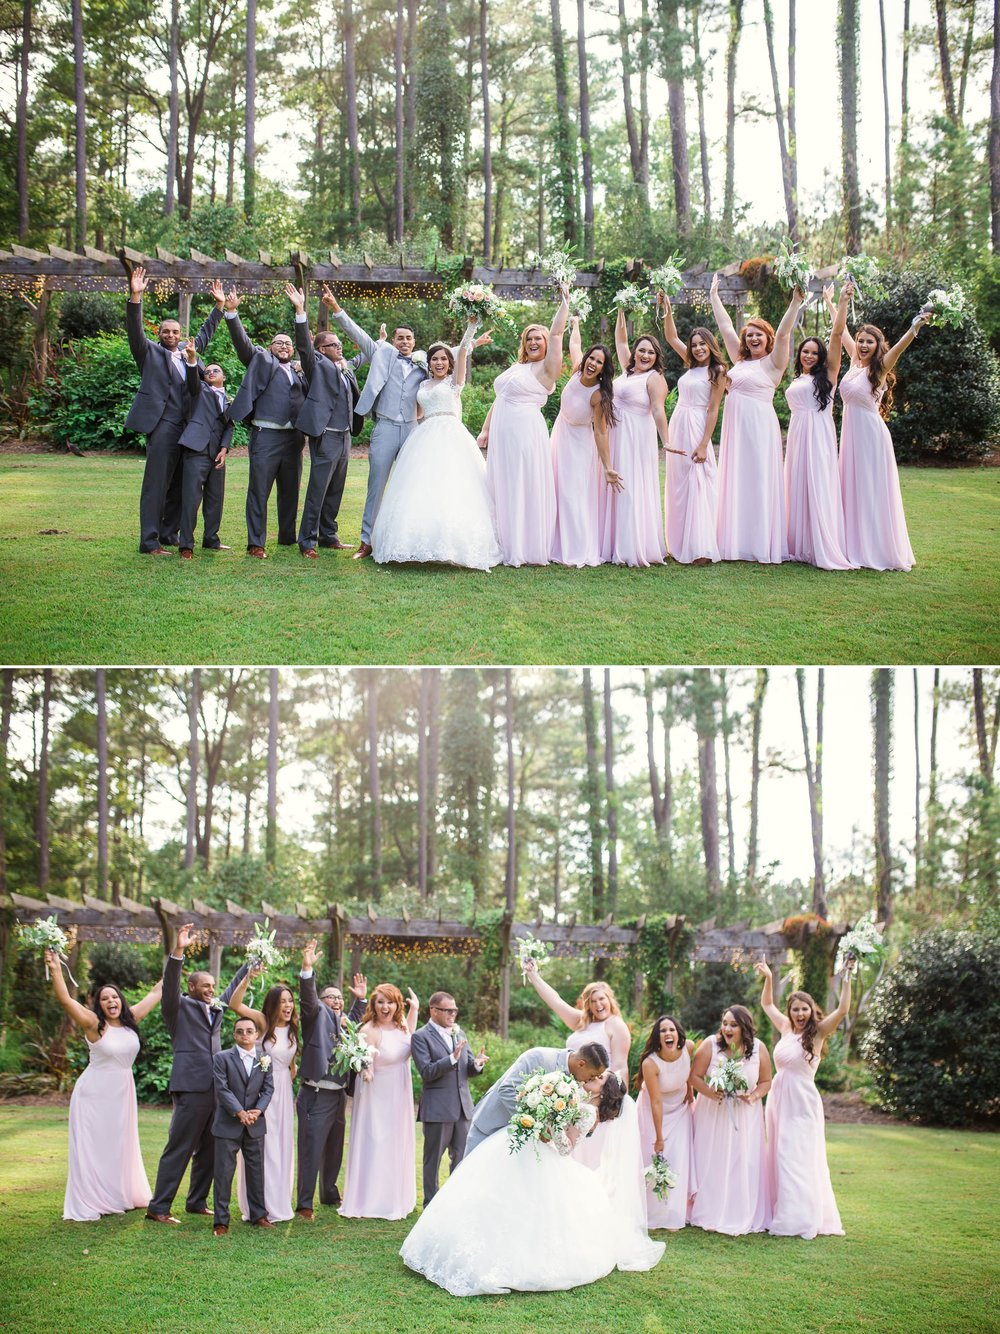 Wedding Party Portraits - Yansi + Eddie - Wedding at Cape Fear Botanical Garden - Fayetteville North Carolina Photographer